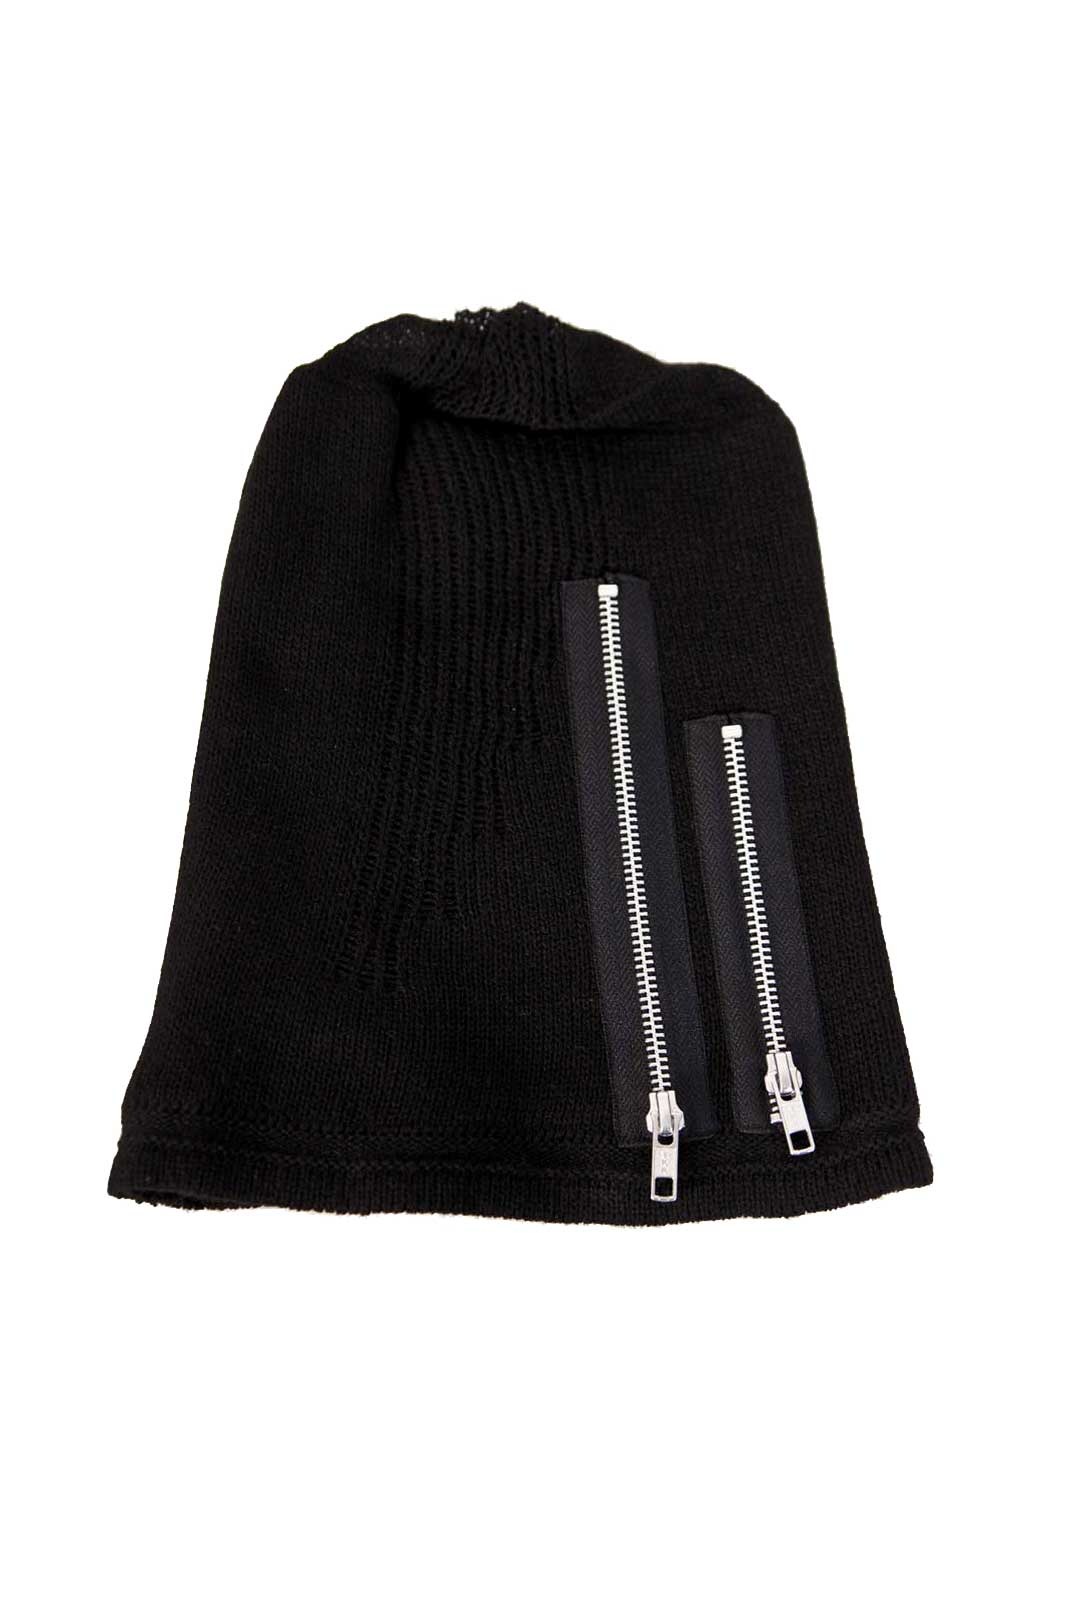 Krueger Hat Black